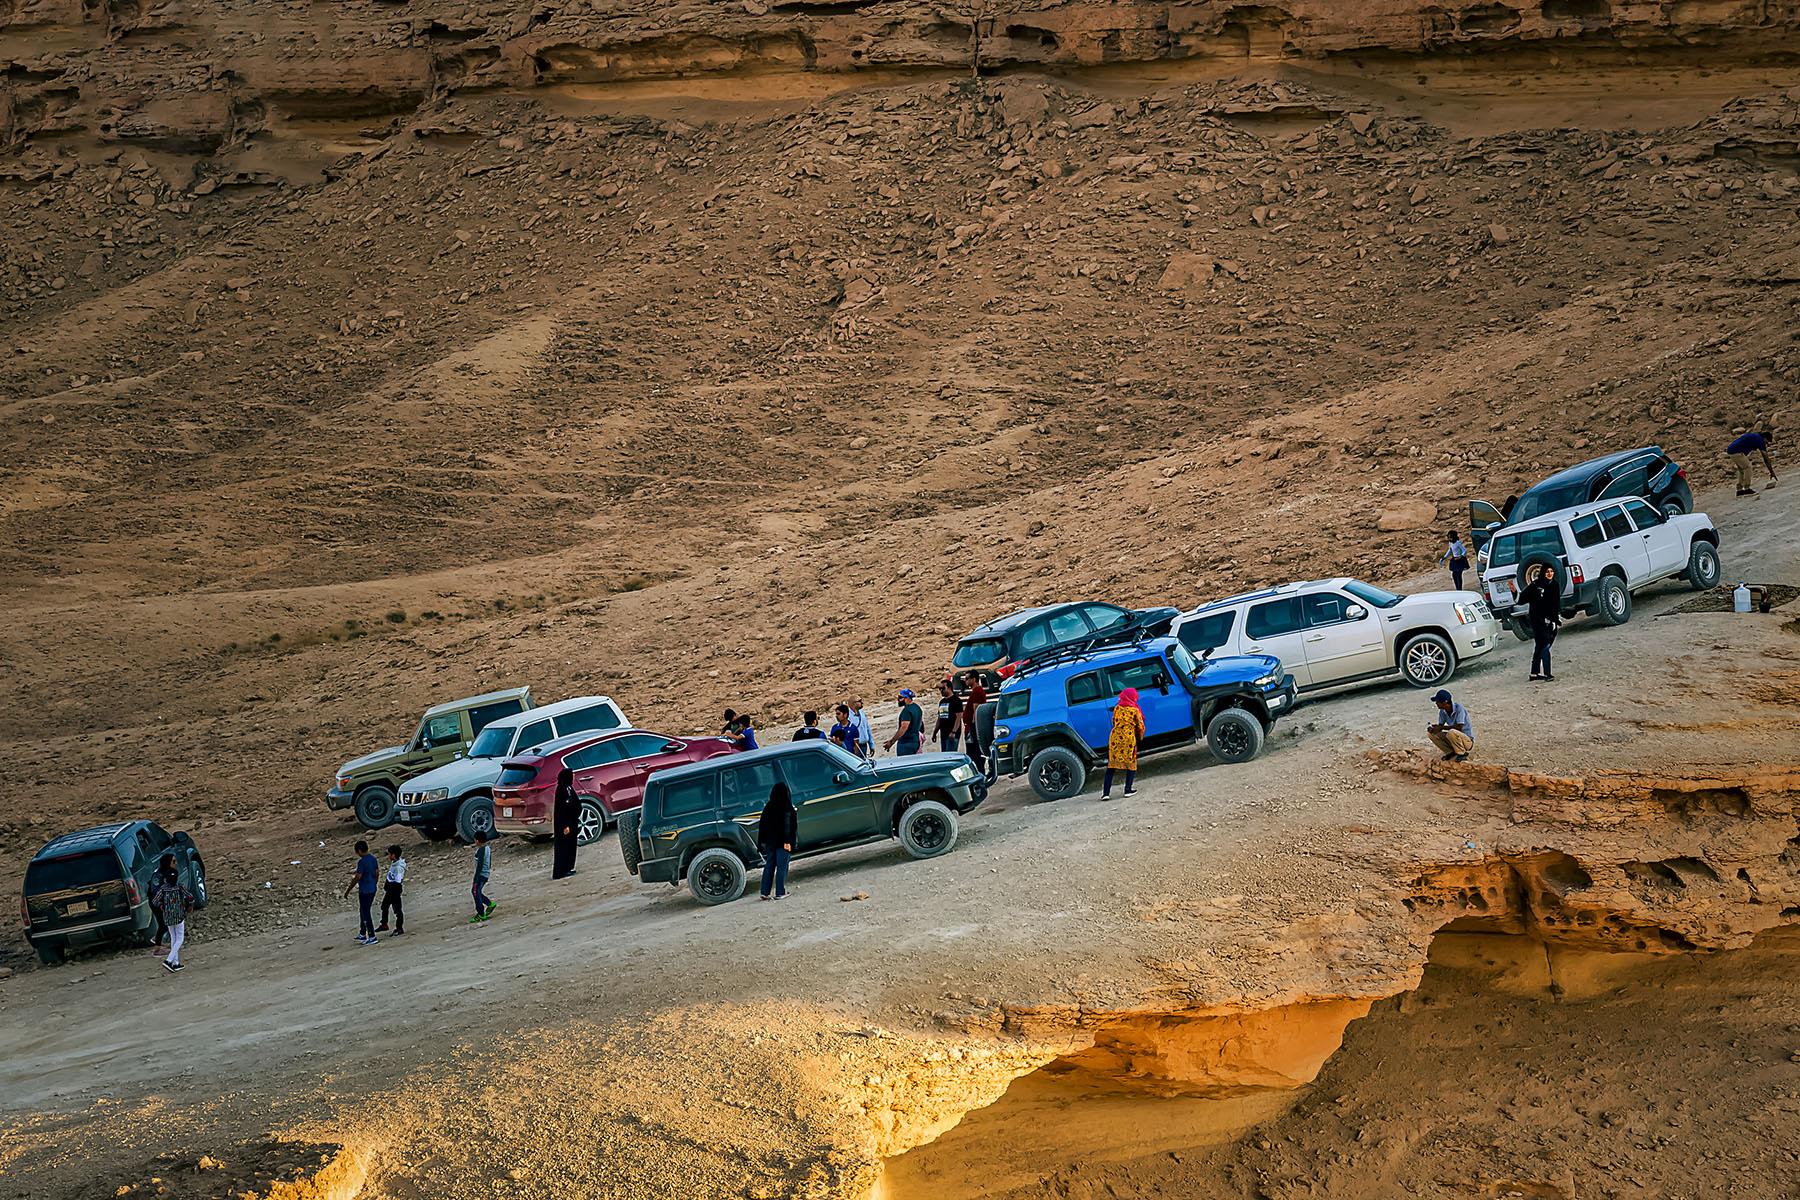 SUVs on a Saudi desert road